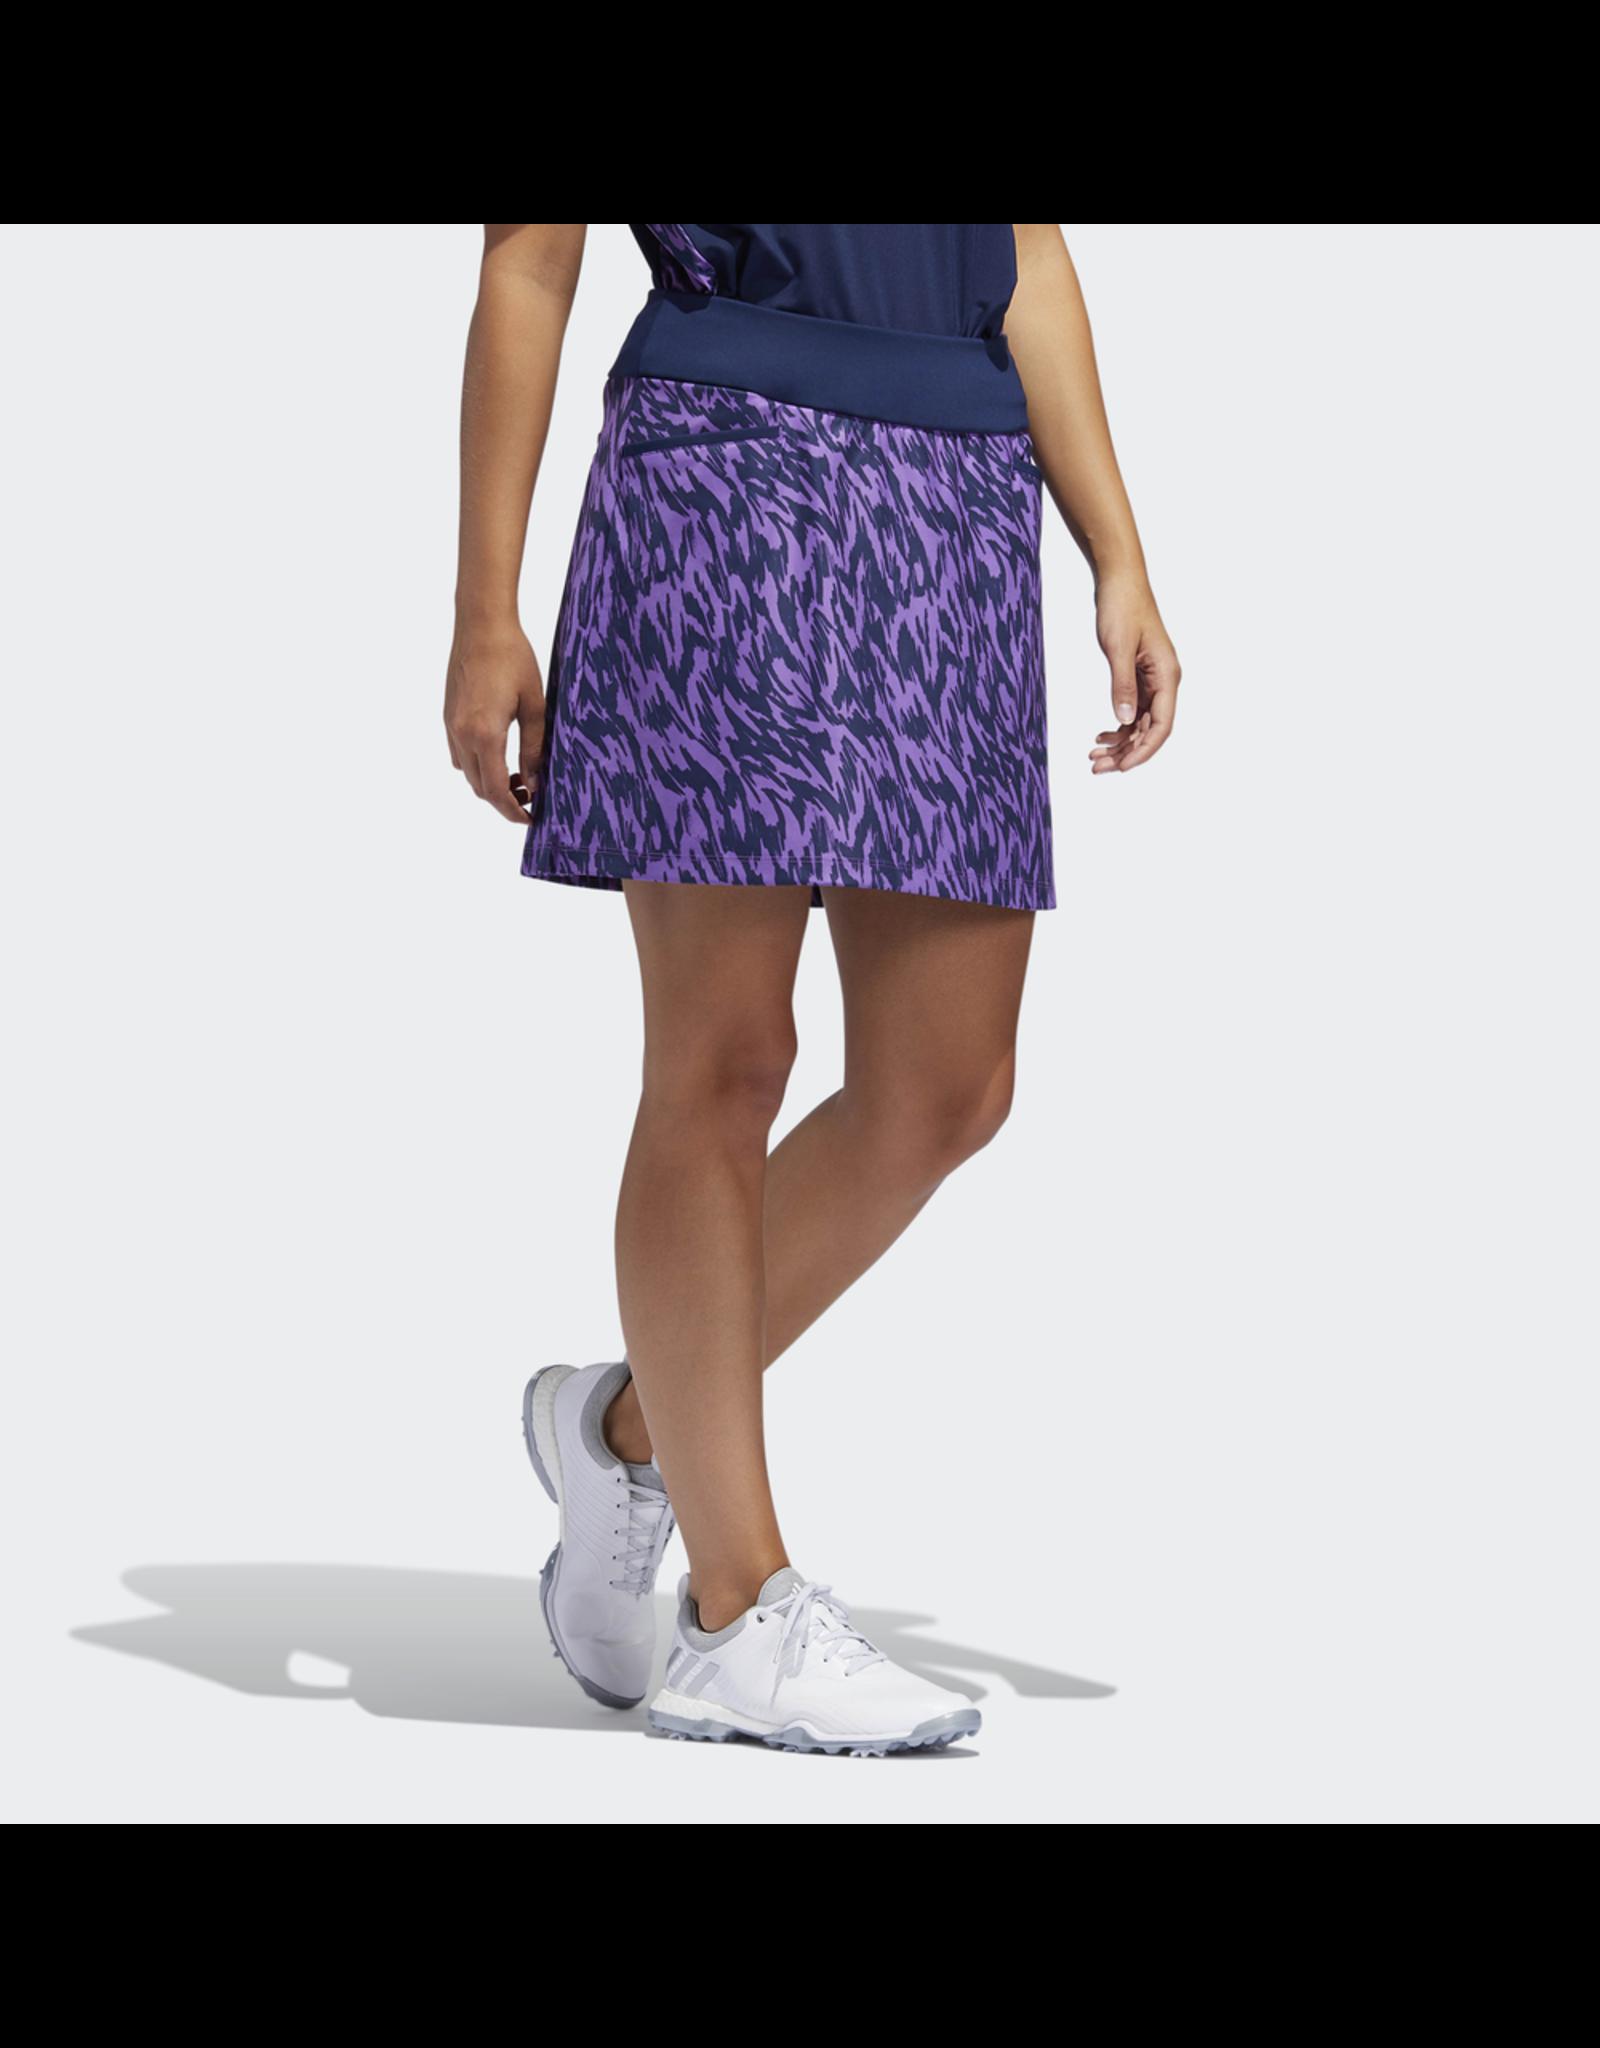 Adidas Adidas Women's Skort (DQ0514)